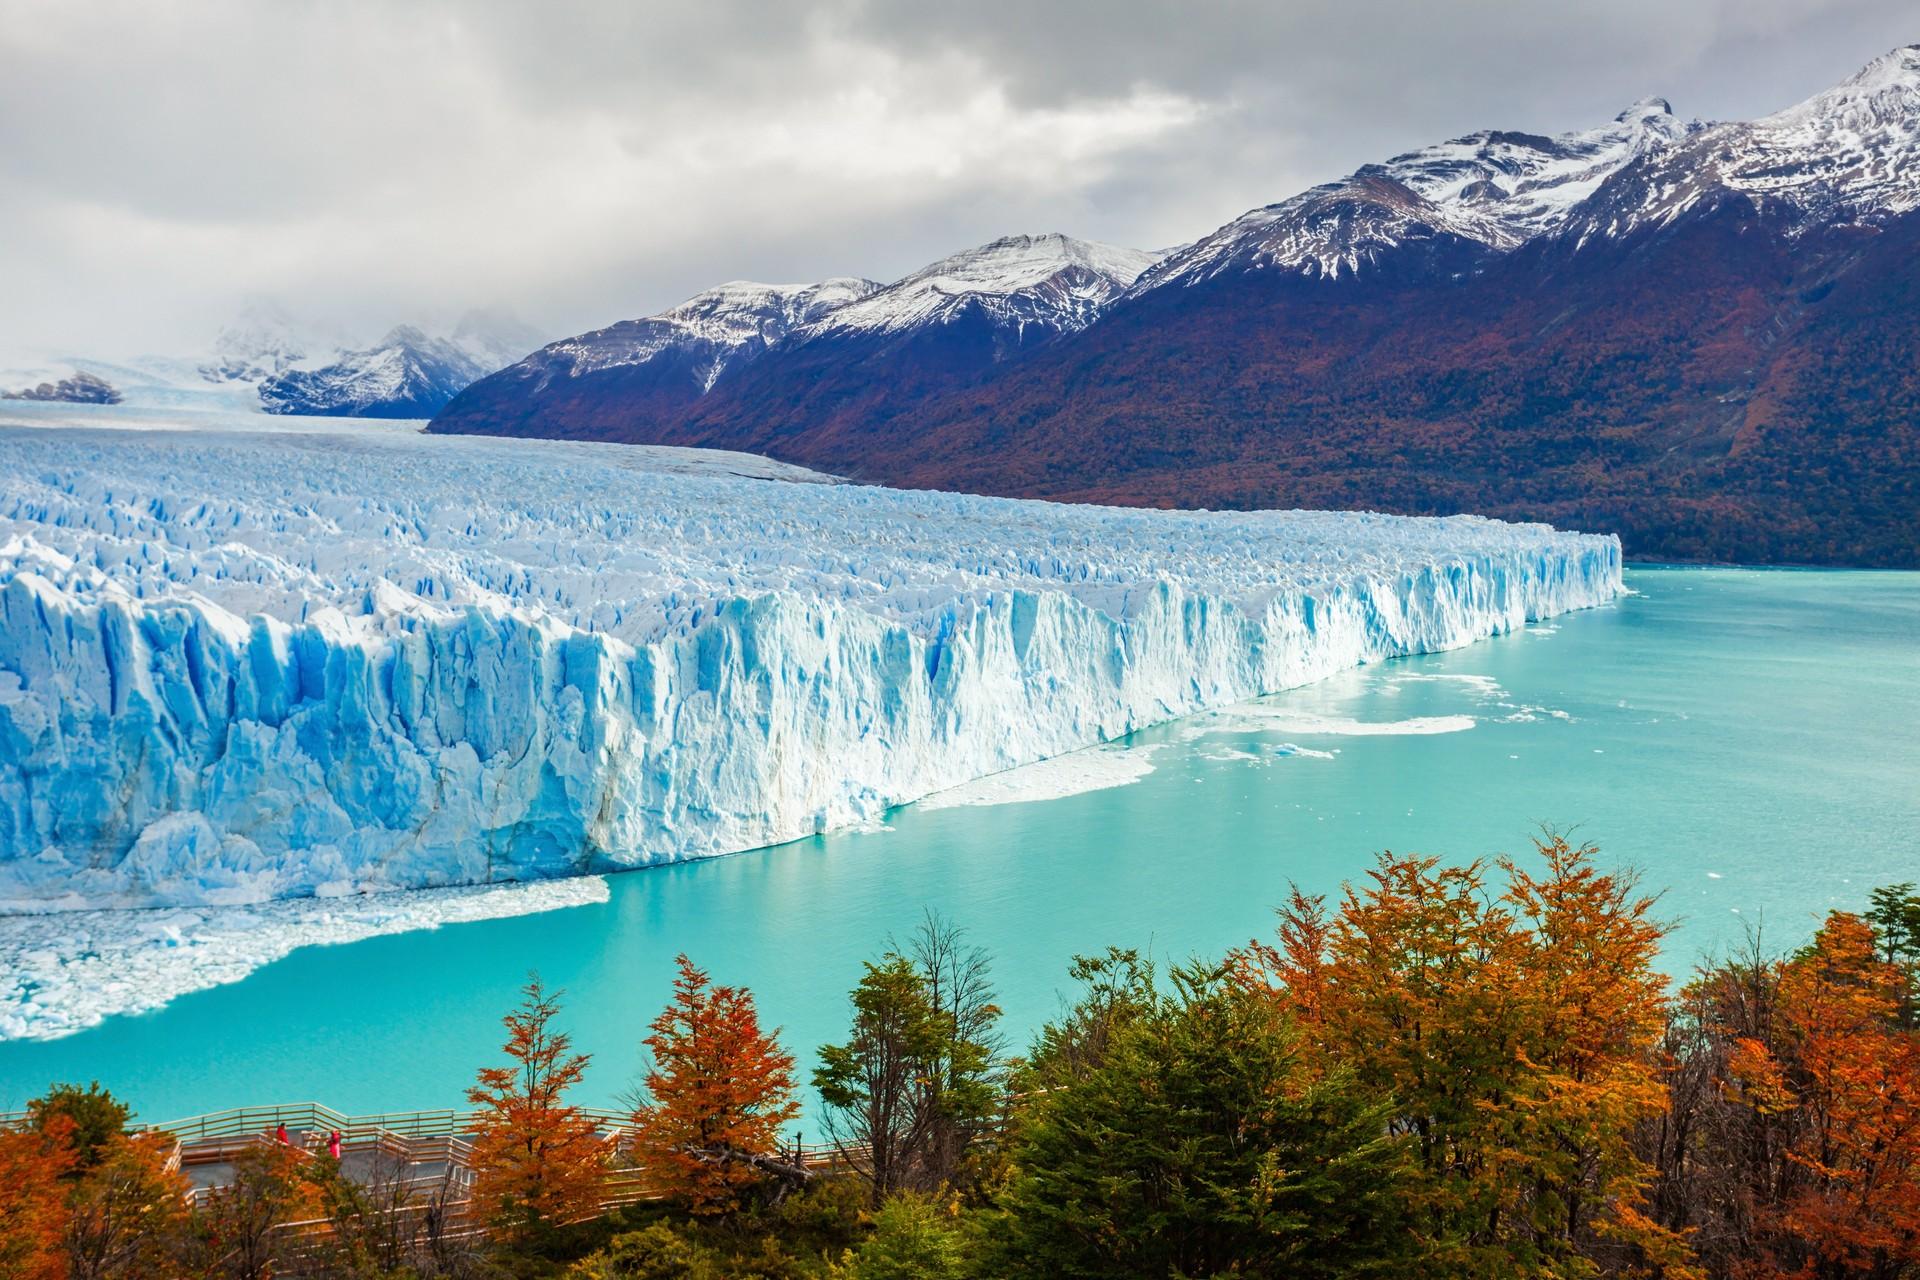 Los Glaciares National Park, Patagonia (Argentina)